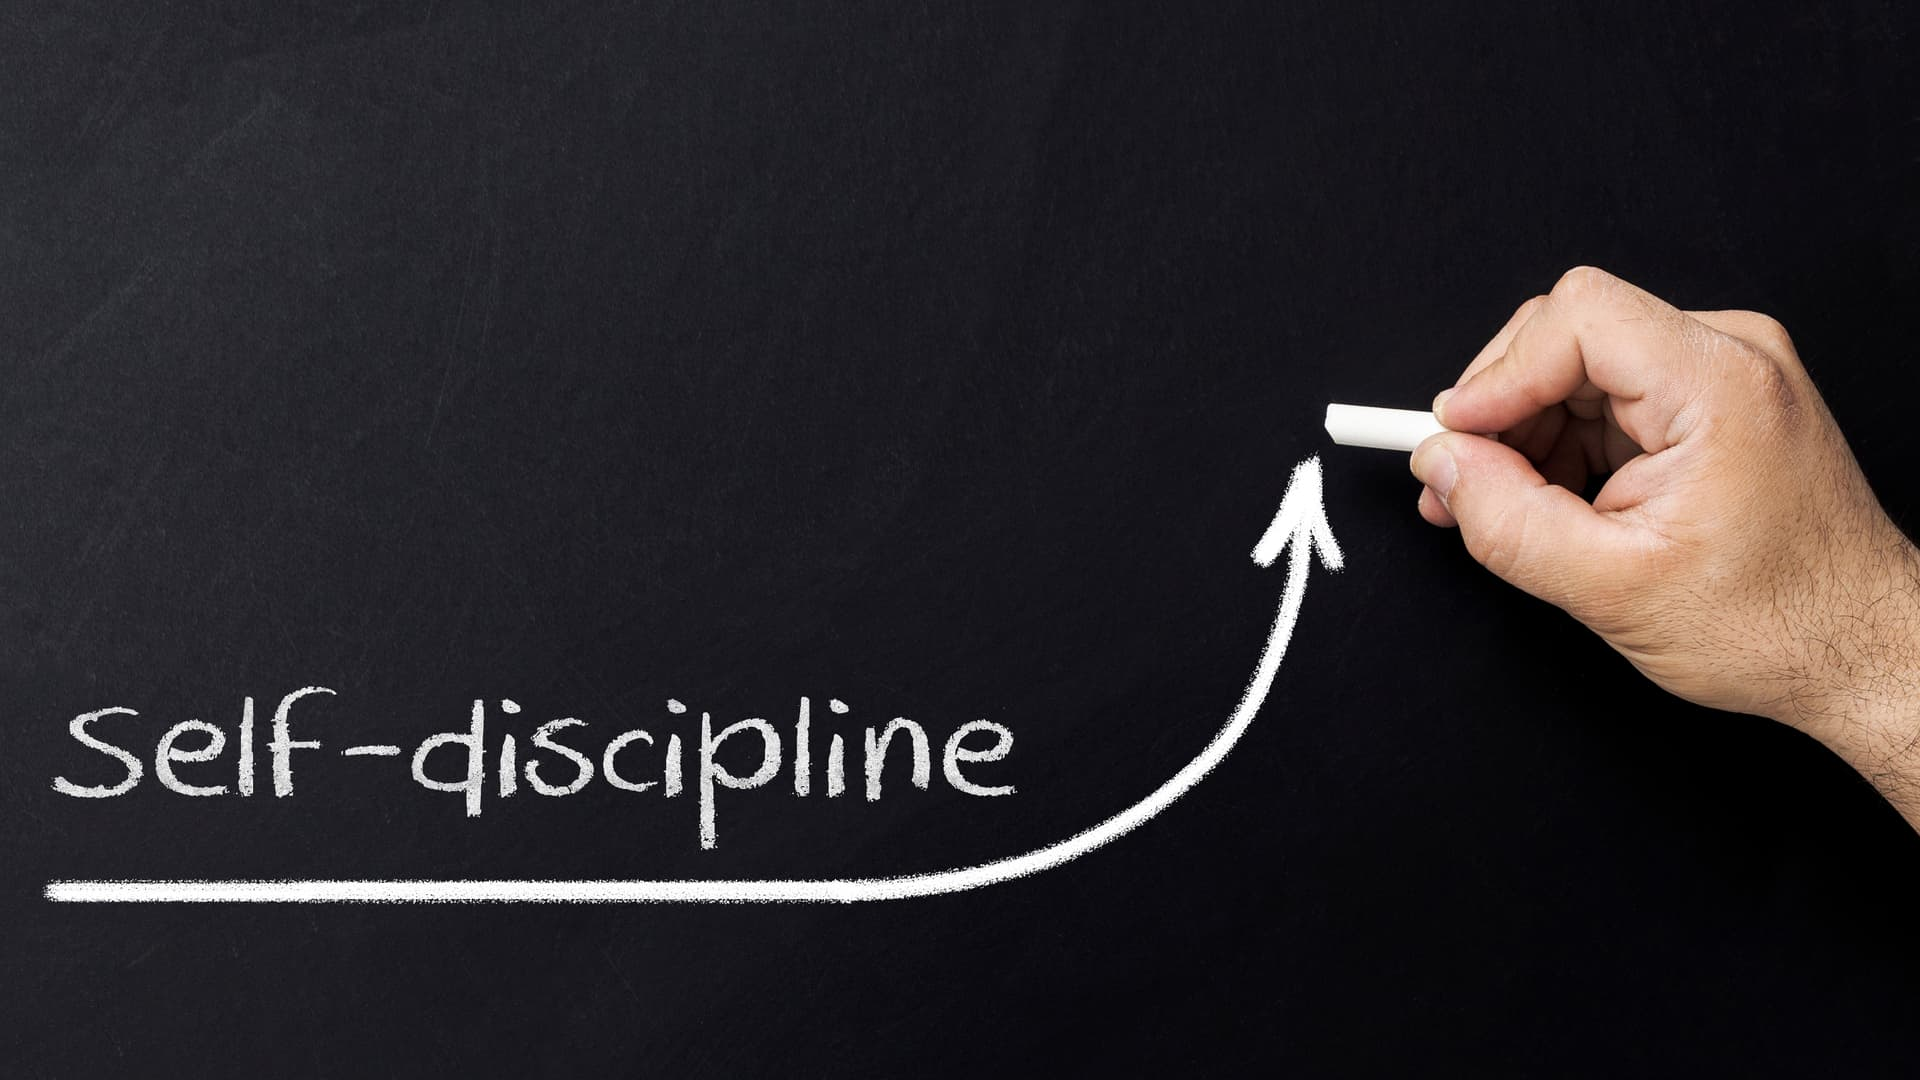 Self discipline concept